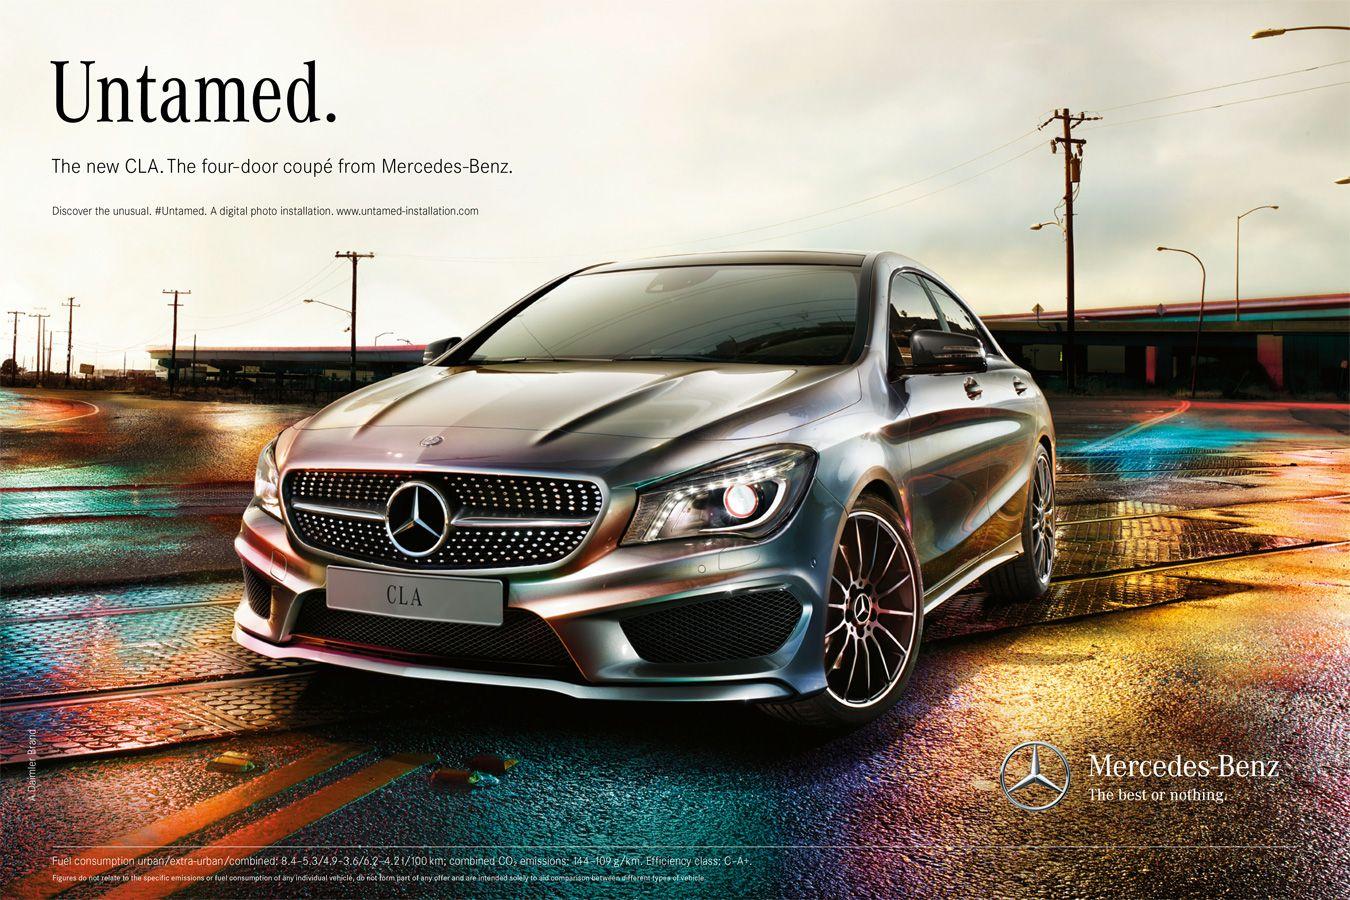 Mercedes cla transportation uwe duettmann ad car for Mercedes benz tagline